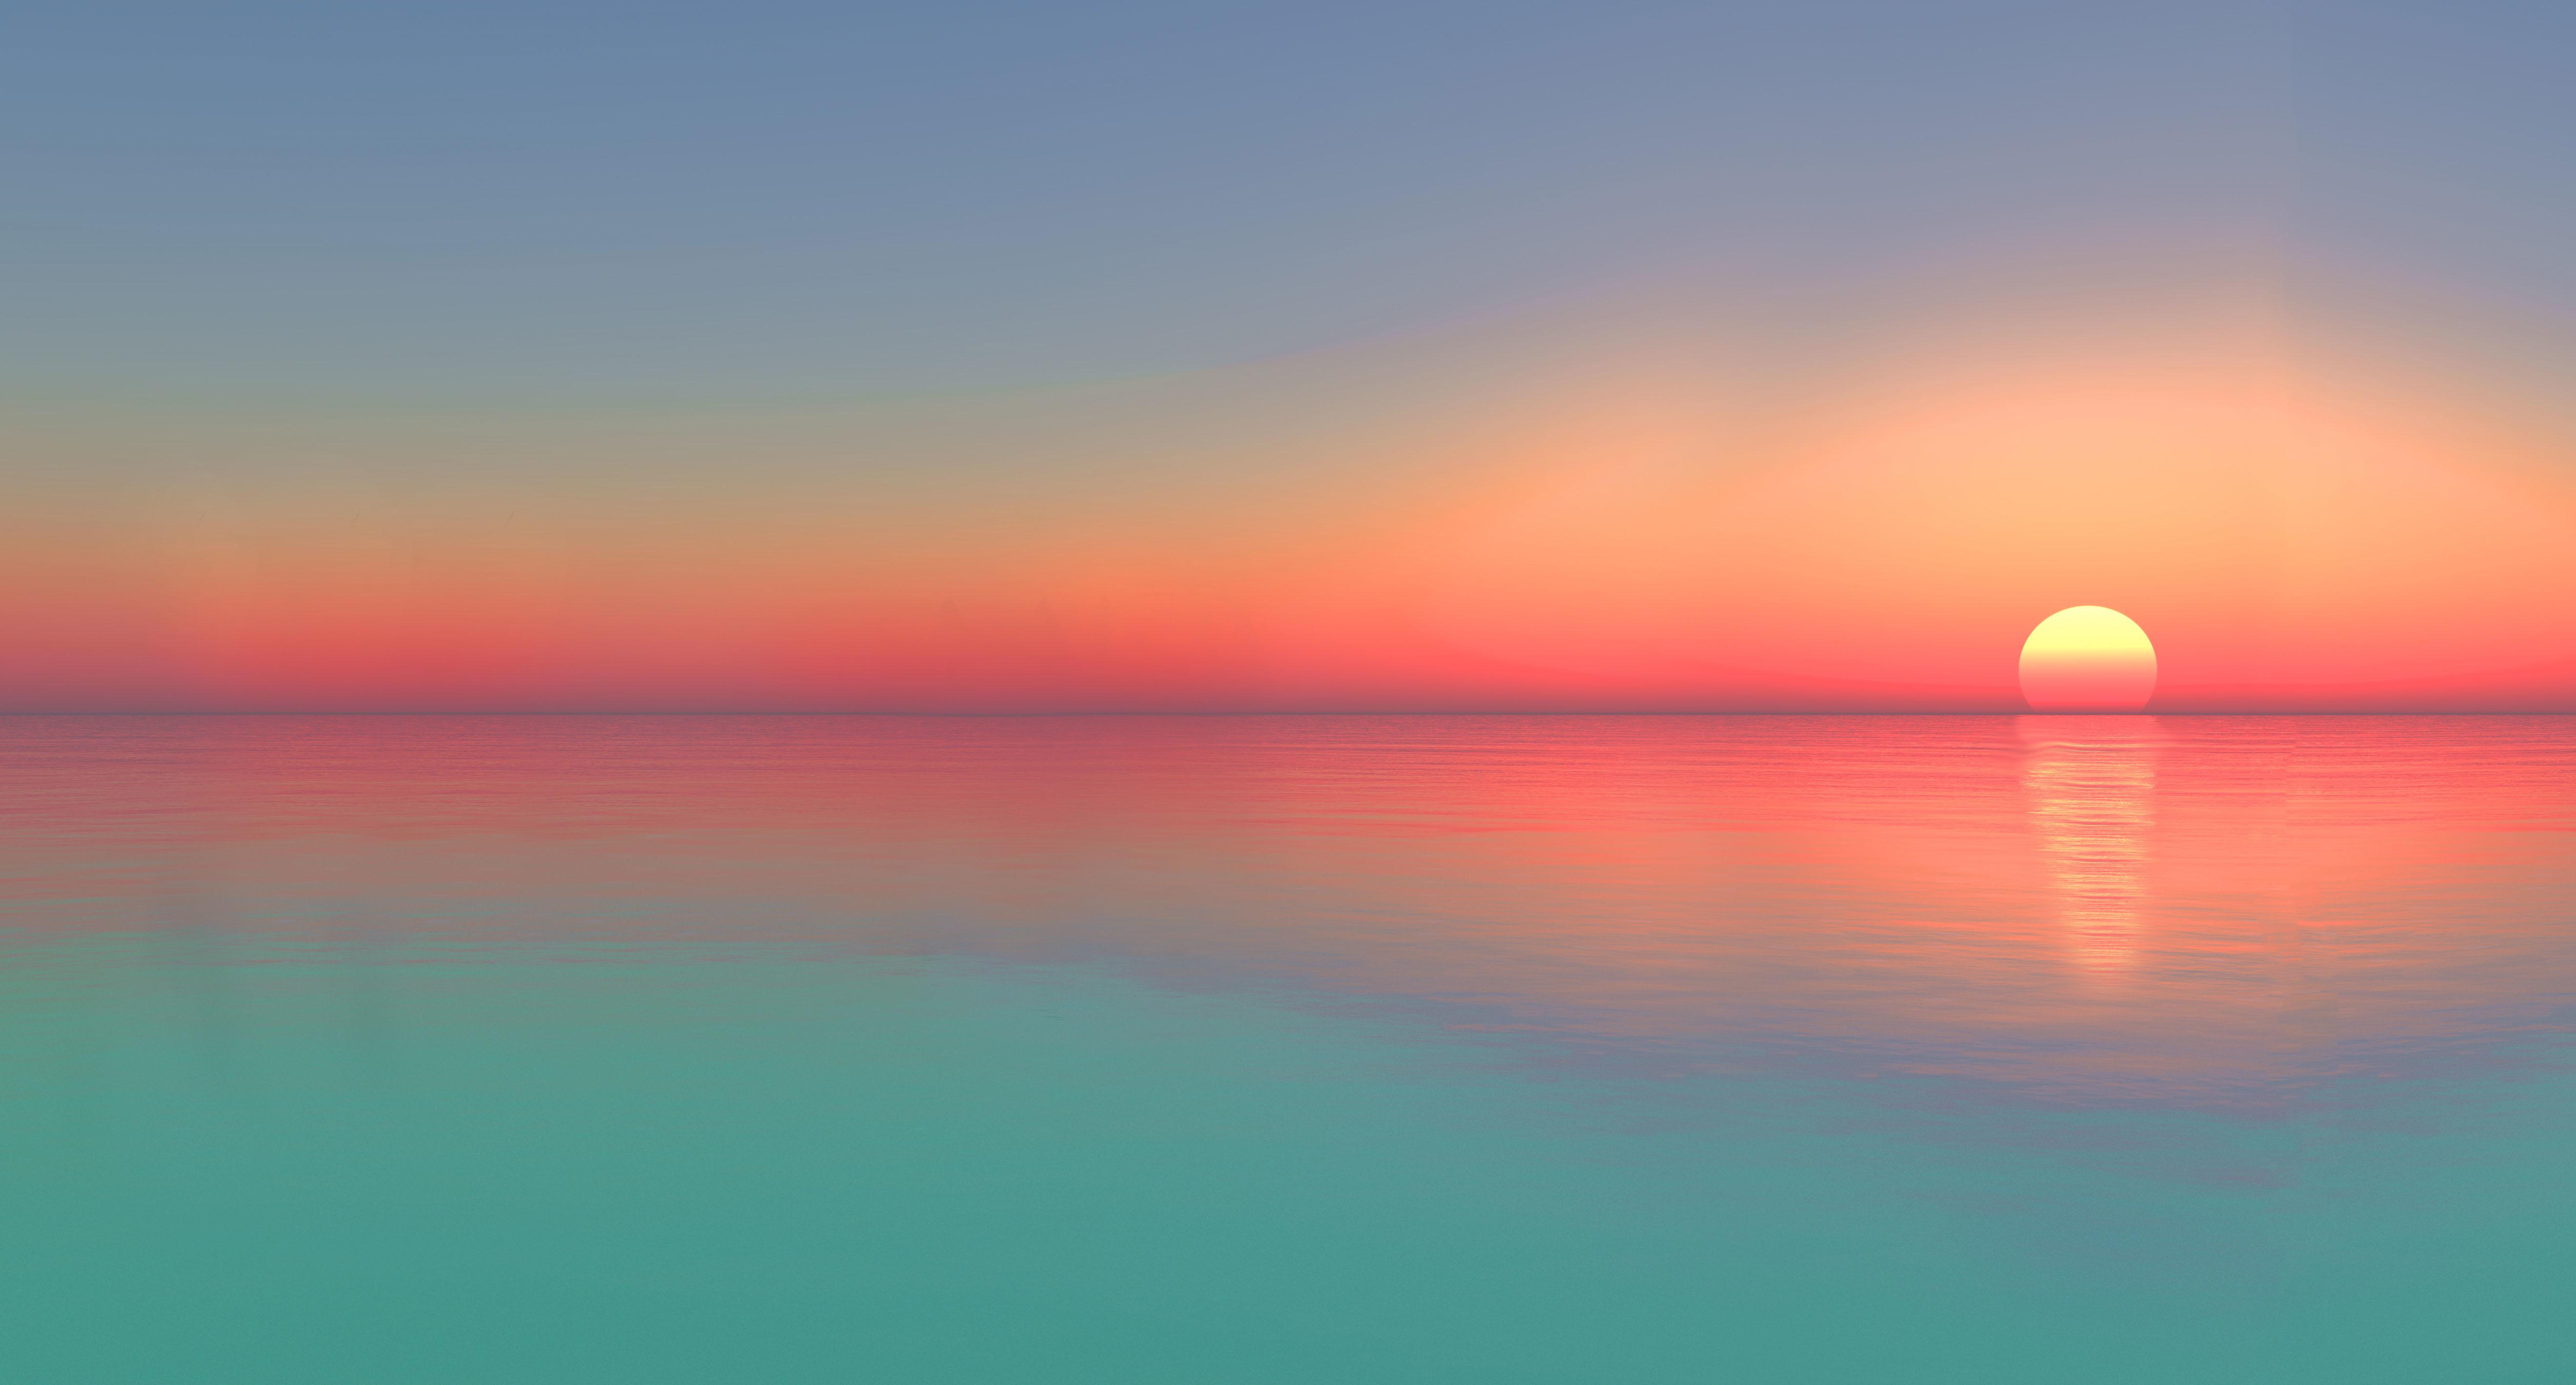 Gradient Calm Sunset Wallpaper Hd Nature 4k Wallpapers